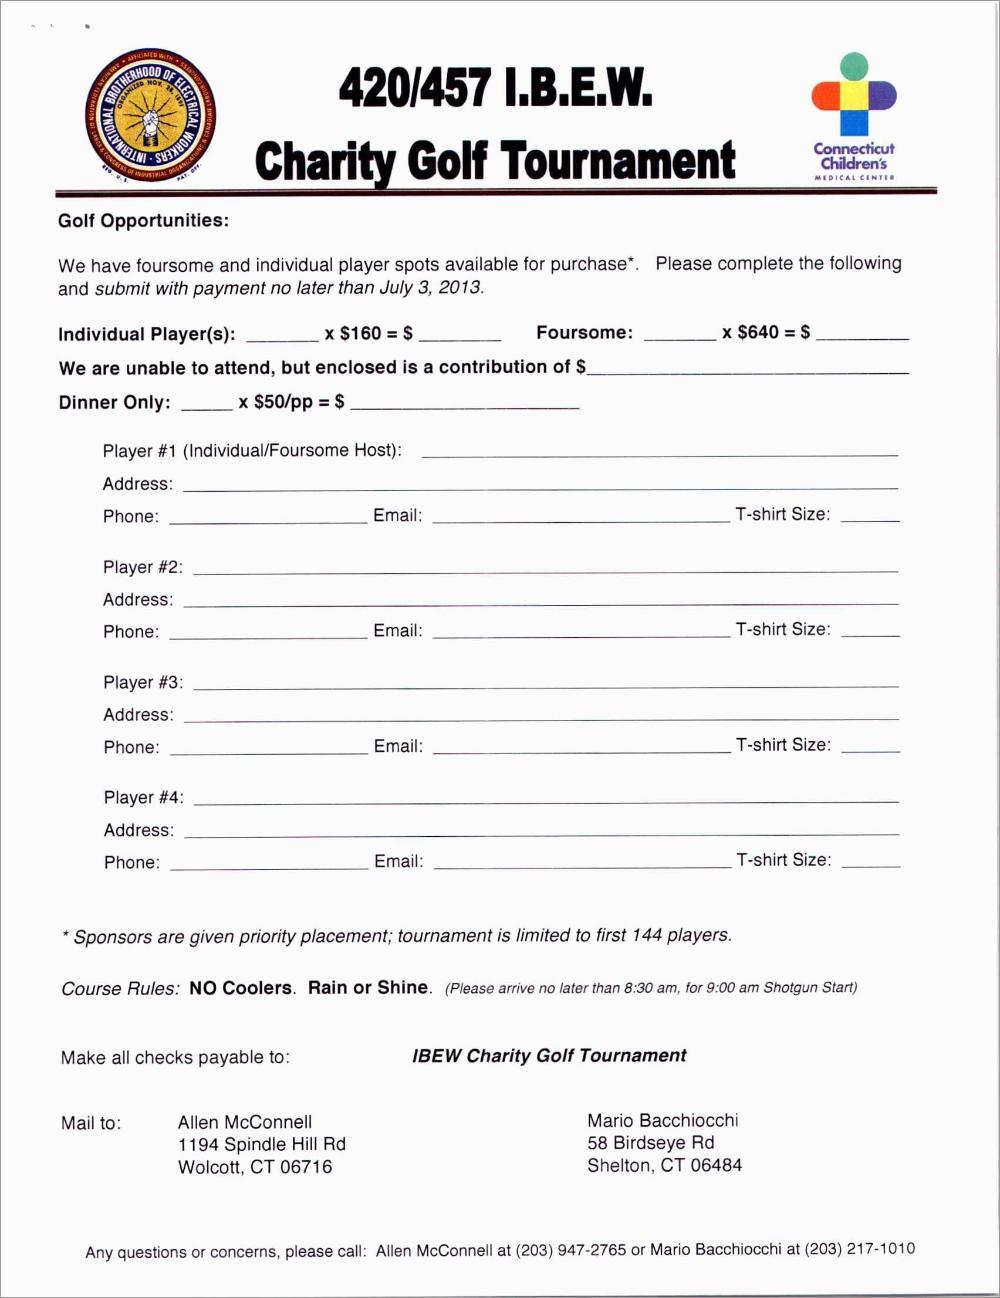 Free Golf Tournament Registration Form Template Fabulous Sponsorship Regarding Golf Tournament Sponsorship A Golf Tournament Professional Templates Tournaments